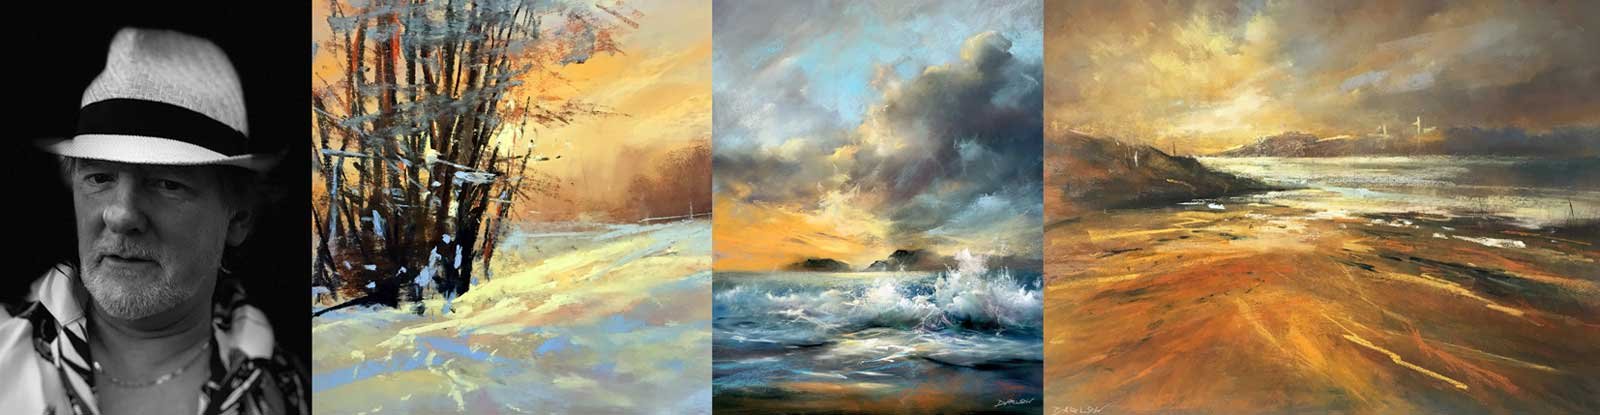 Montage of Les Darlow's landscape work.